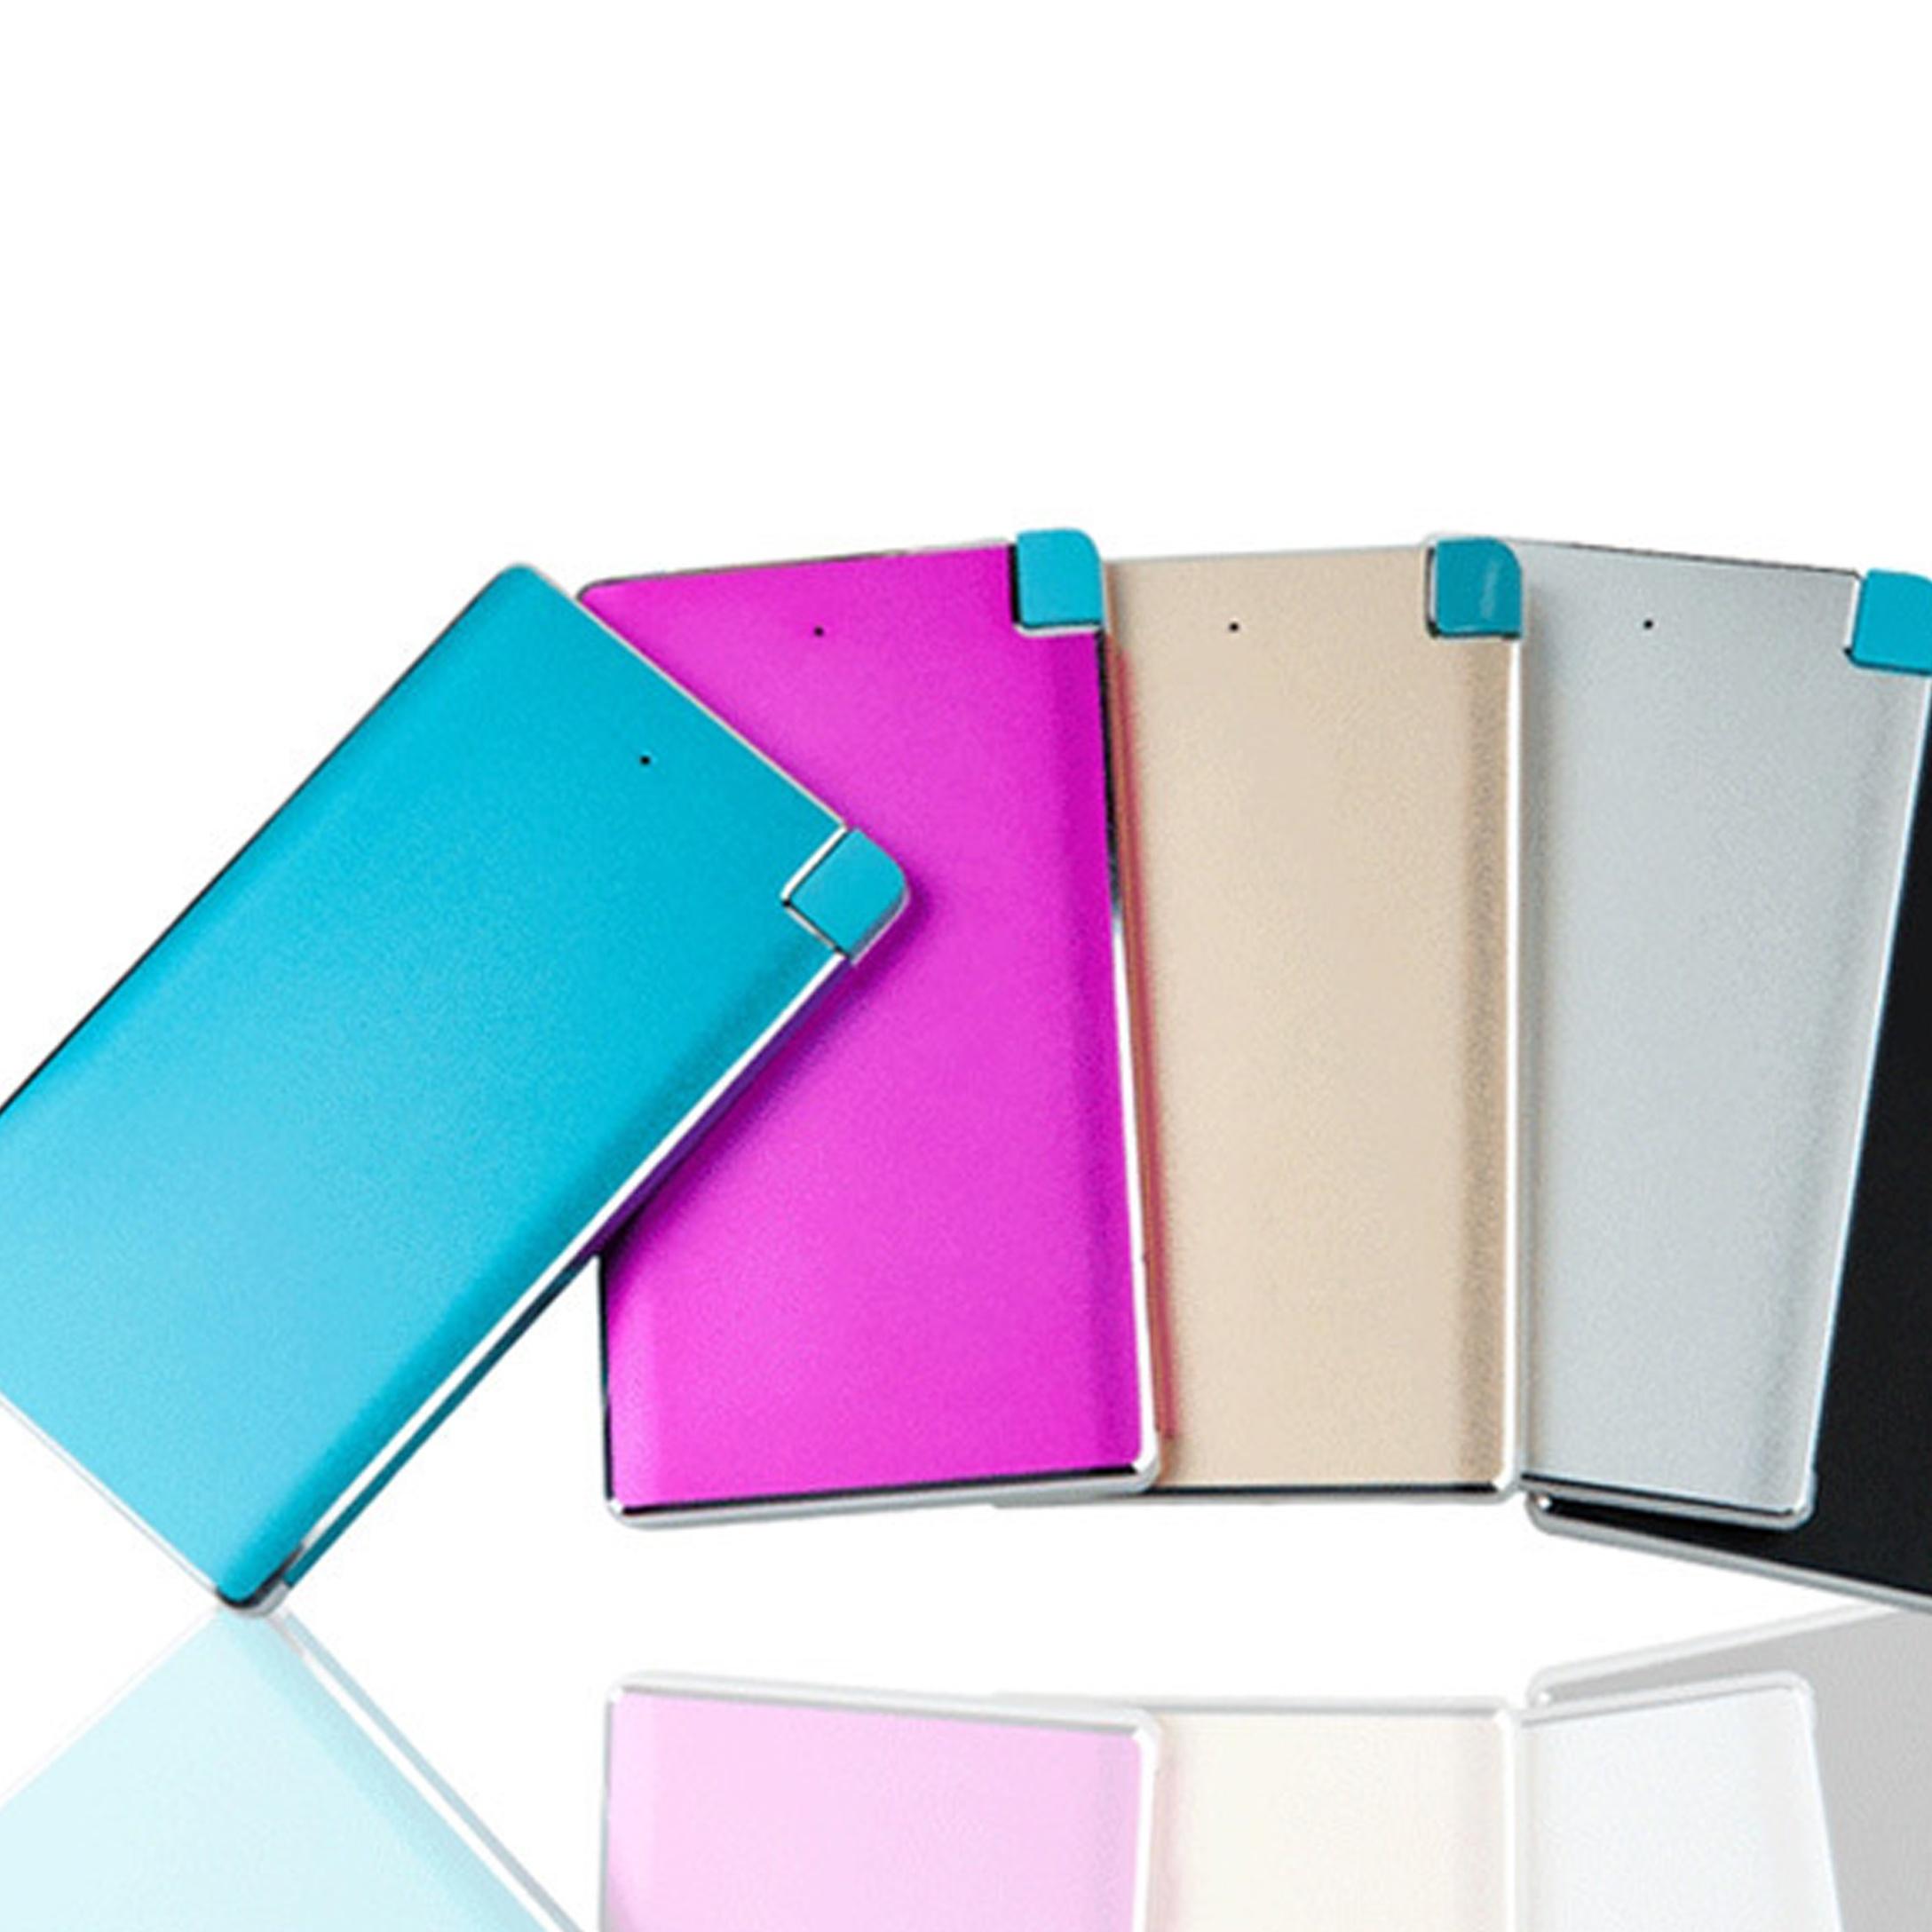 Promotional Gift Full Color Personalized Logo Printing 2500mAh Slim Credit Card Power Bank фото